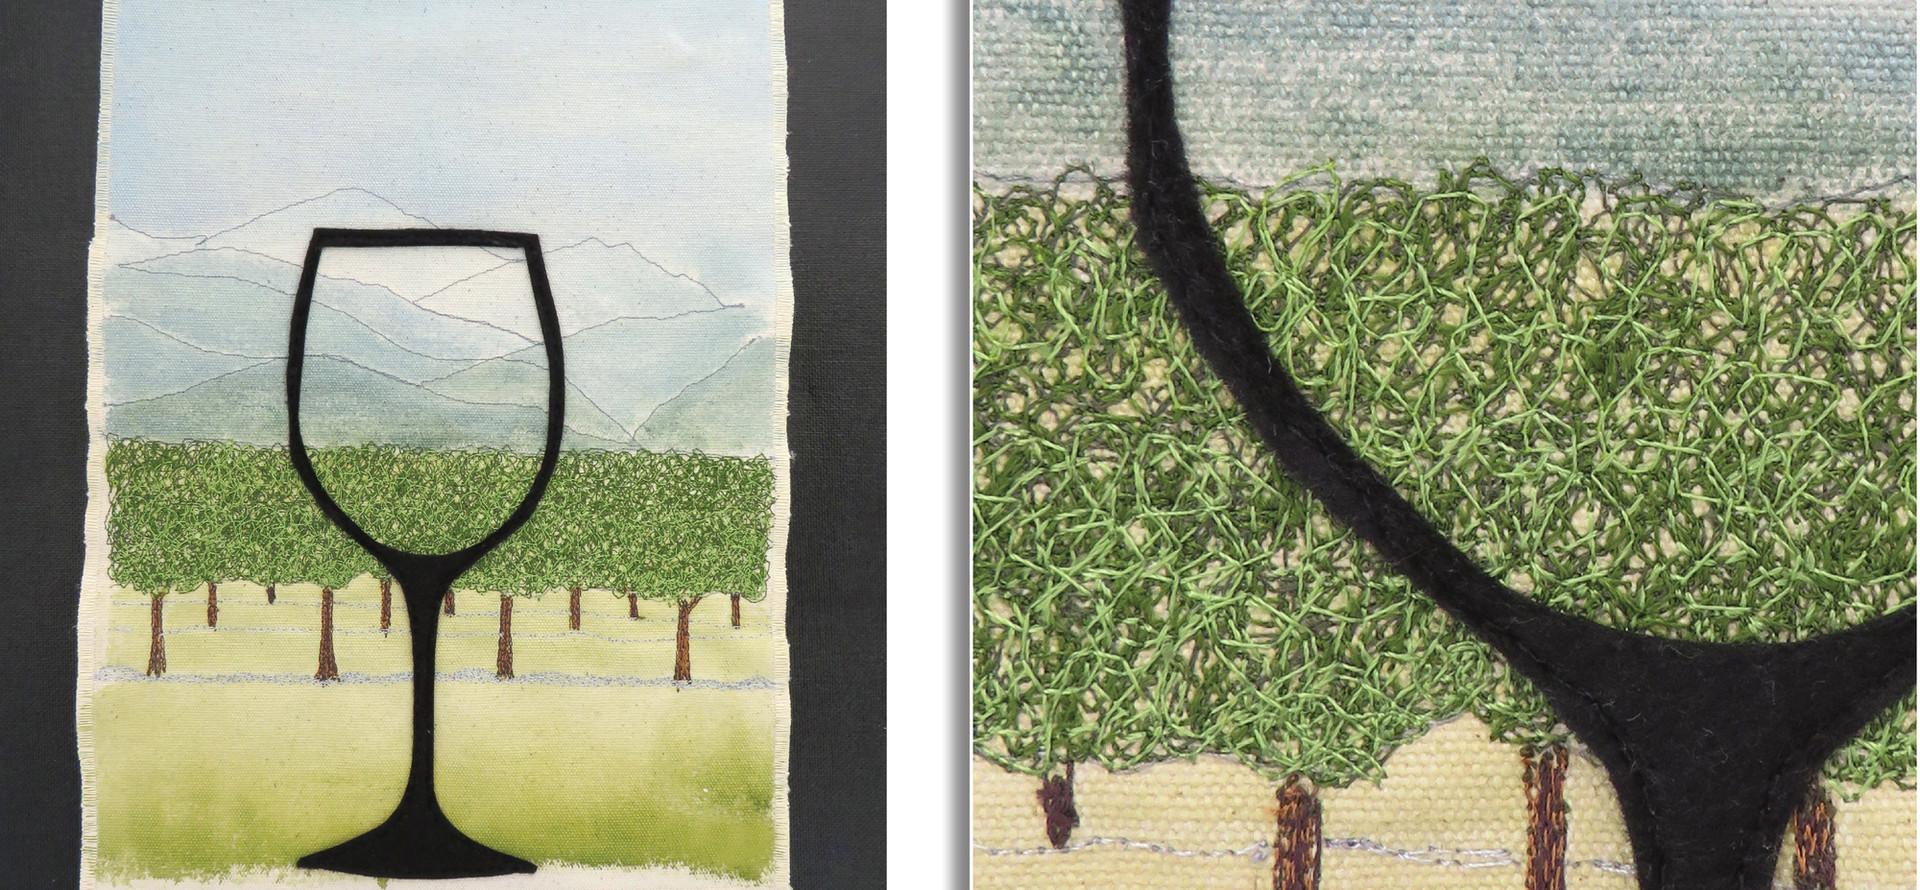 MARLBOROUGH IN A GLASS by Glenys Fry, Marlborough Guild.